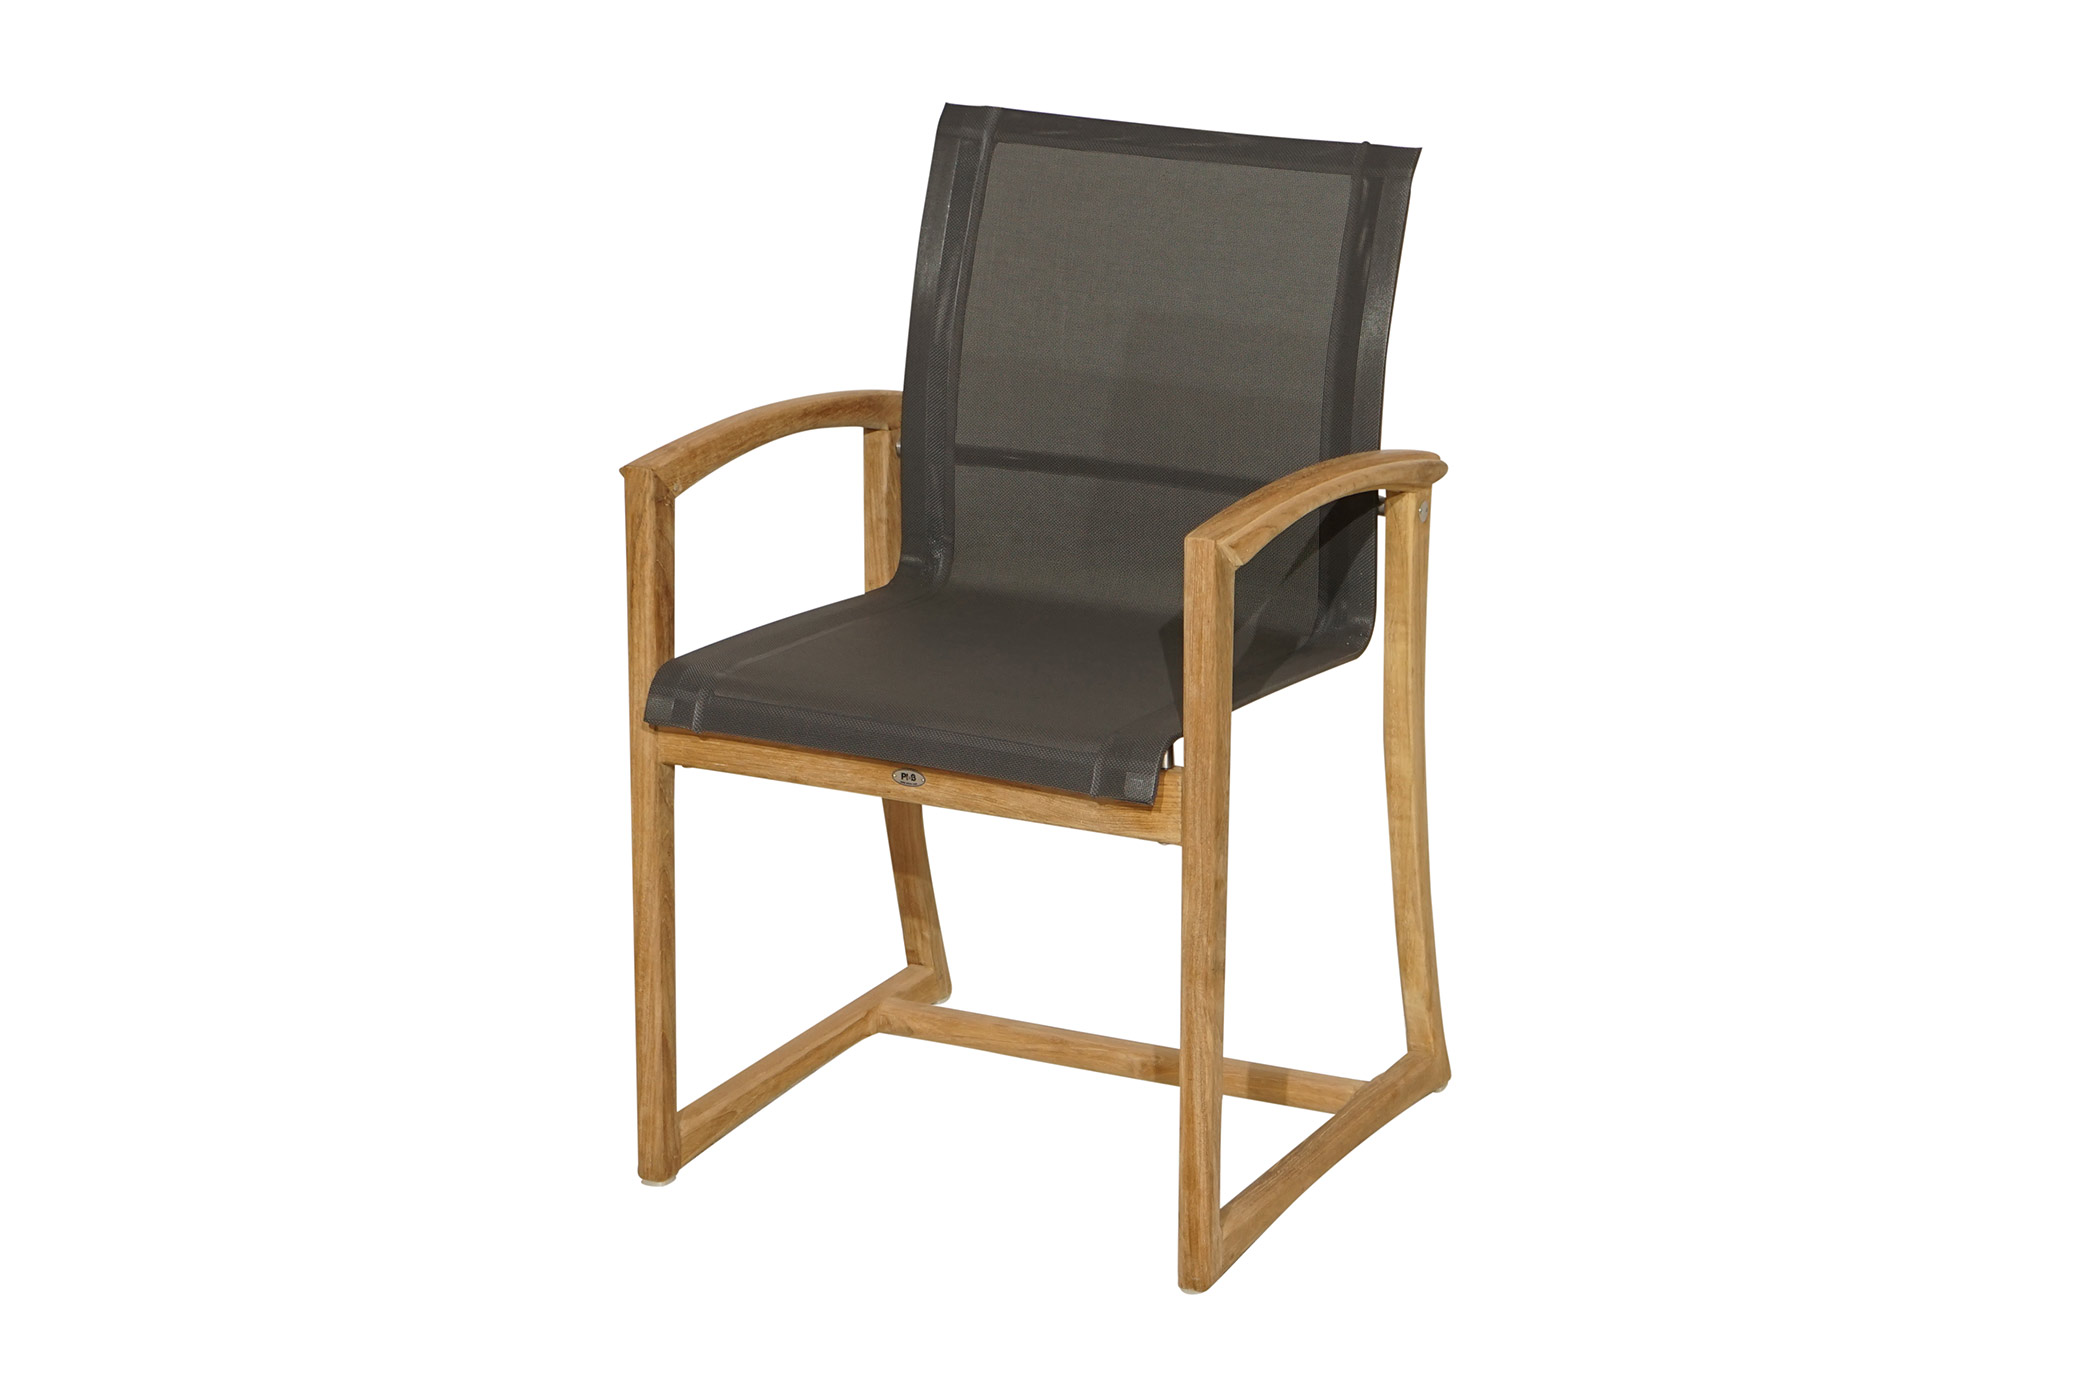 stuhl formentera teak wetterfeste textilbespannung gartenst hle gartenst hle gartenm bel. Black Bedroom Furniture Sets. Home Design Ideas